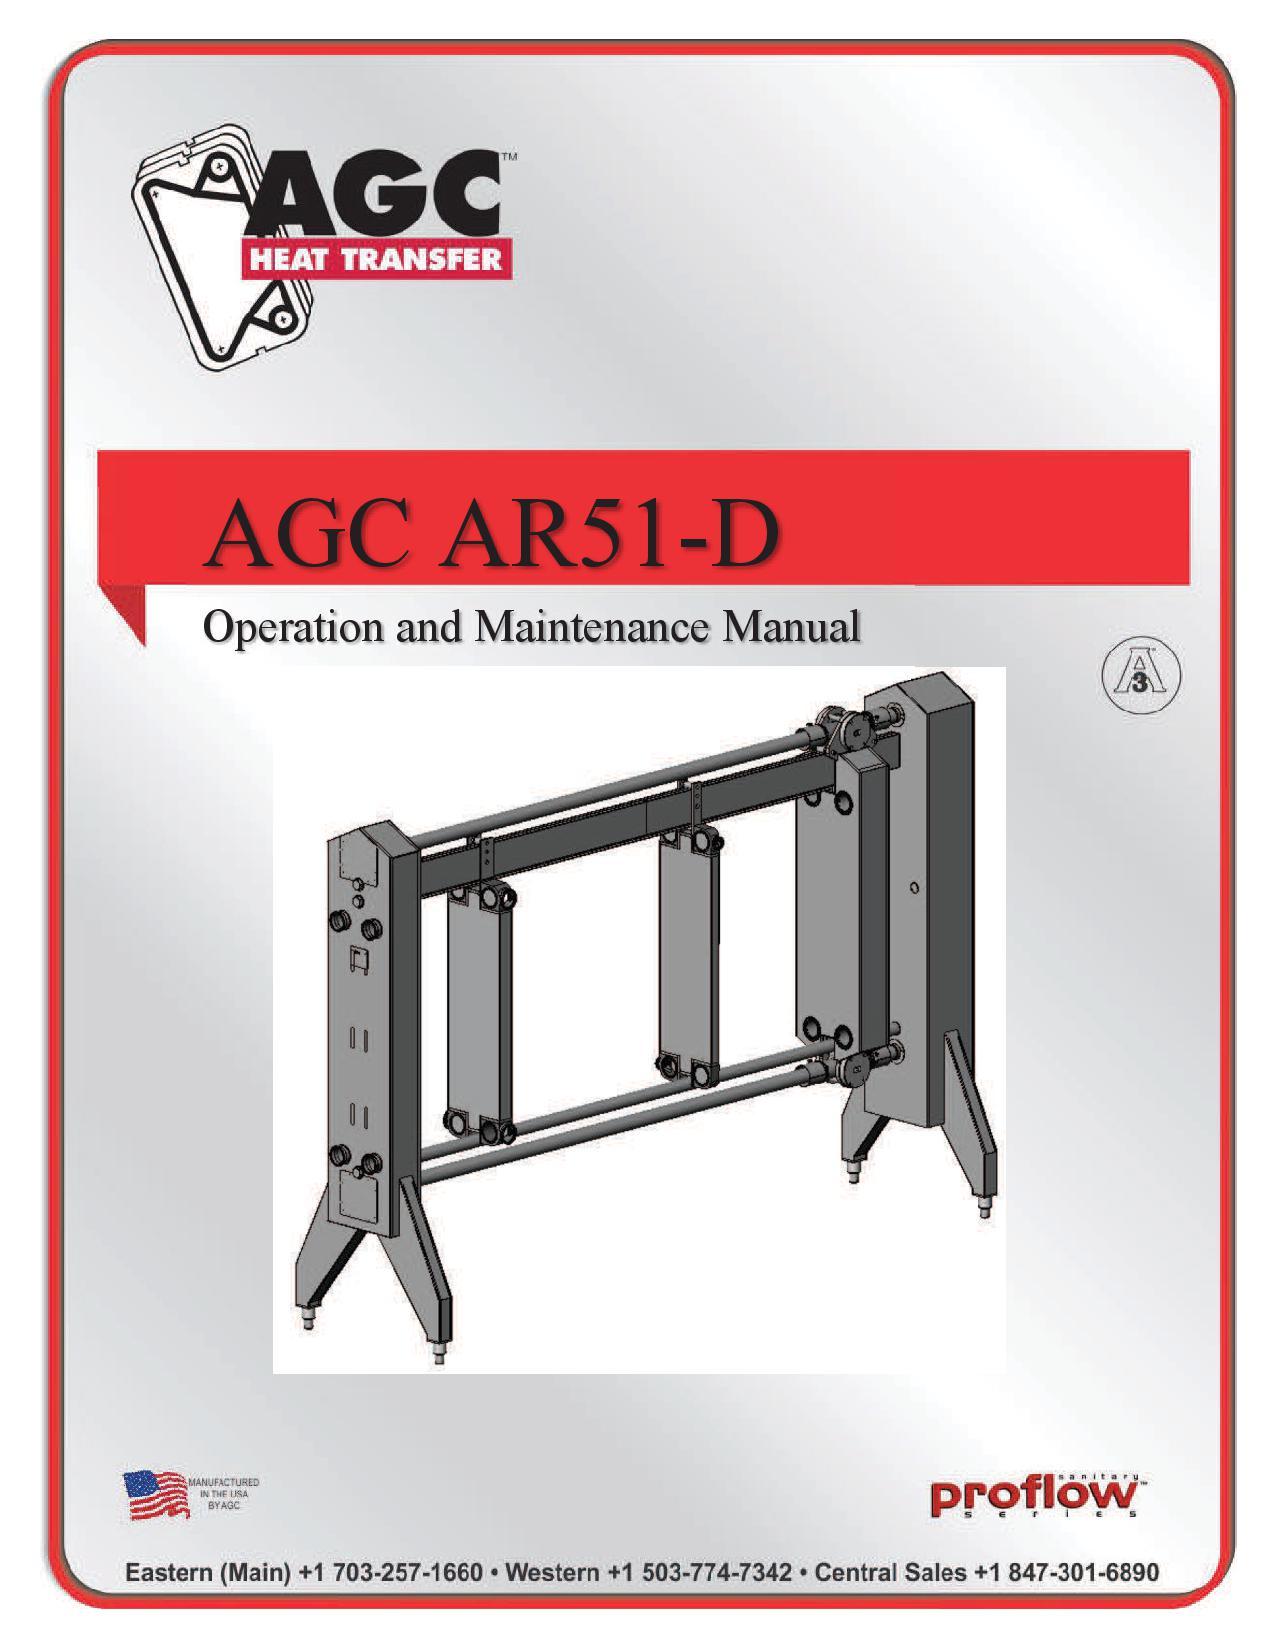 AR51-D OPERATION MANUAL